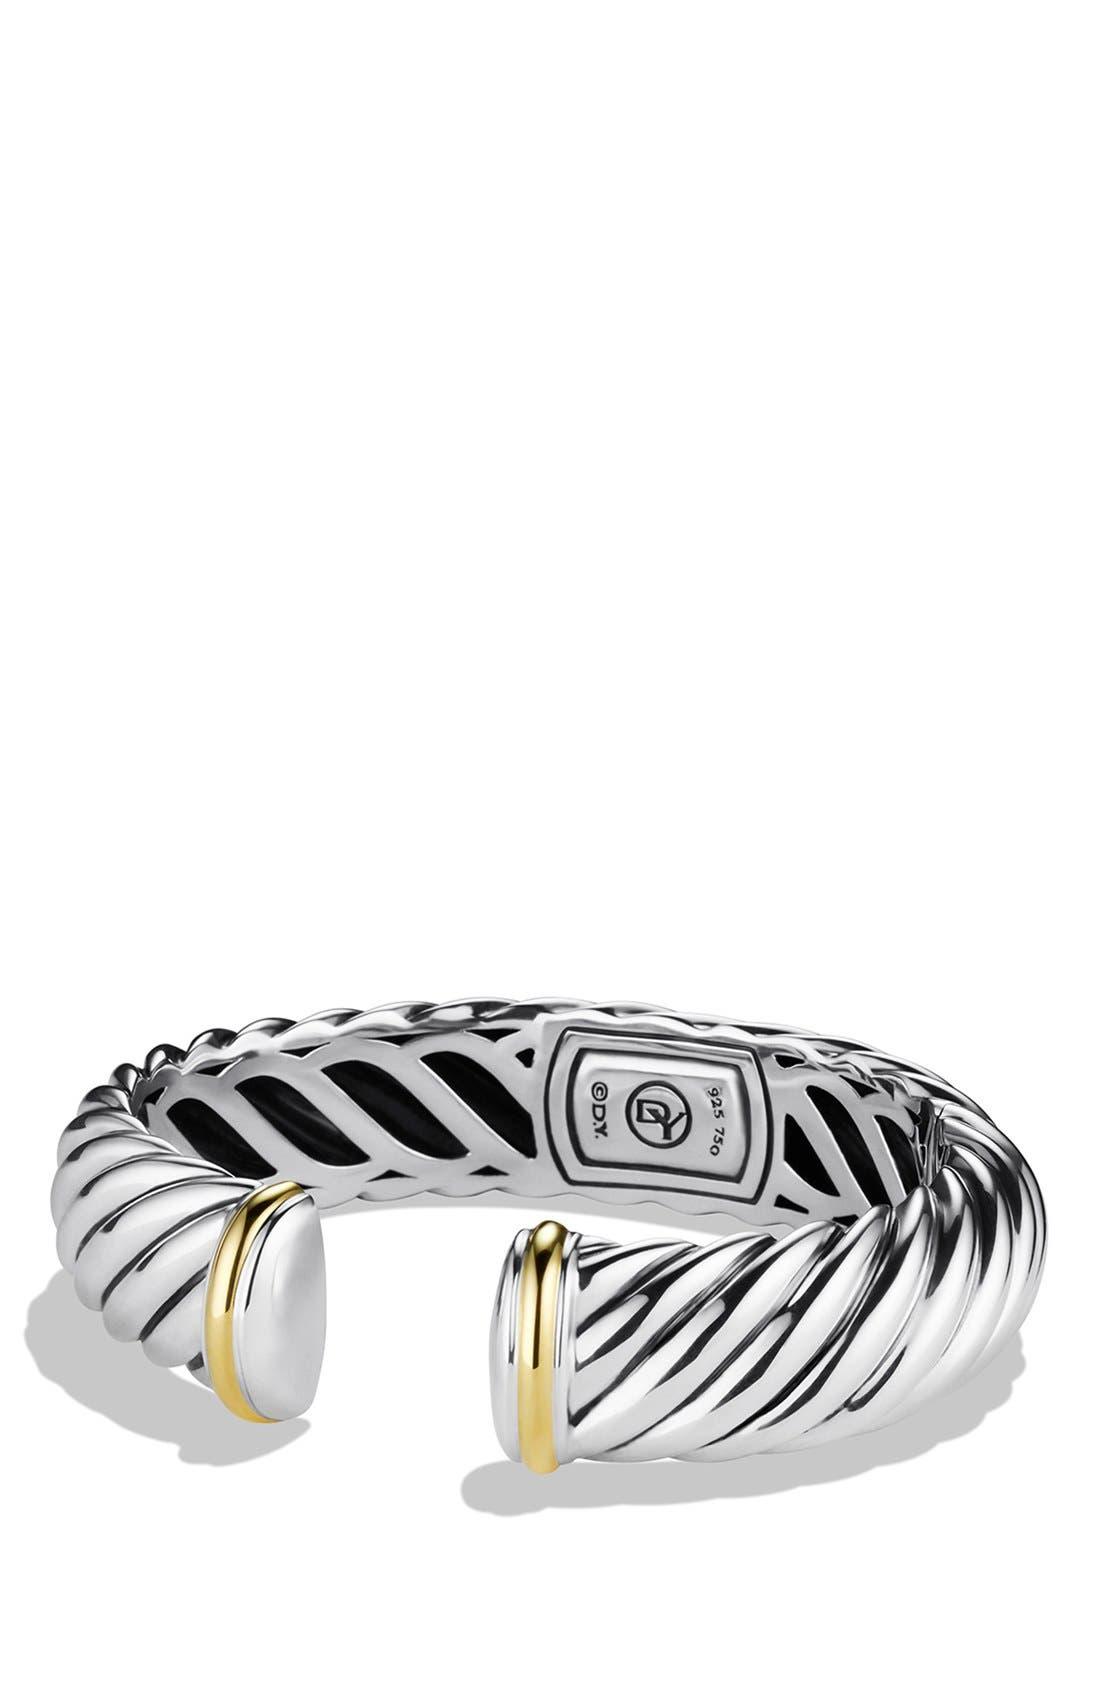 Alternate Image 1 Selected - David Yurman 'Waverly' Bracelet with Gold